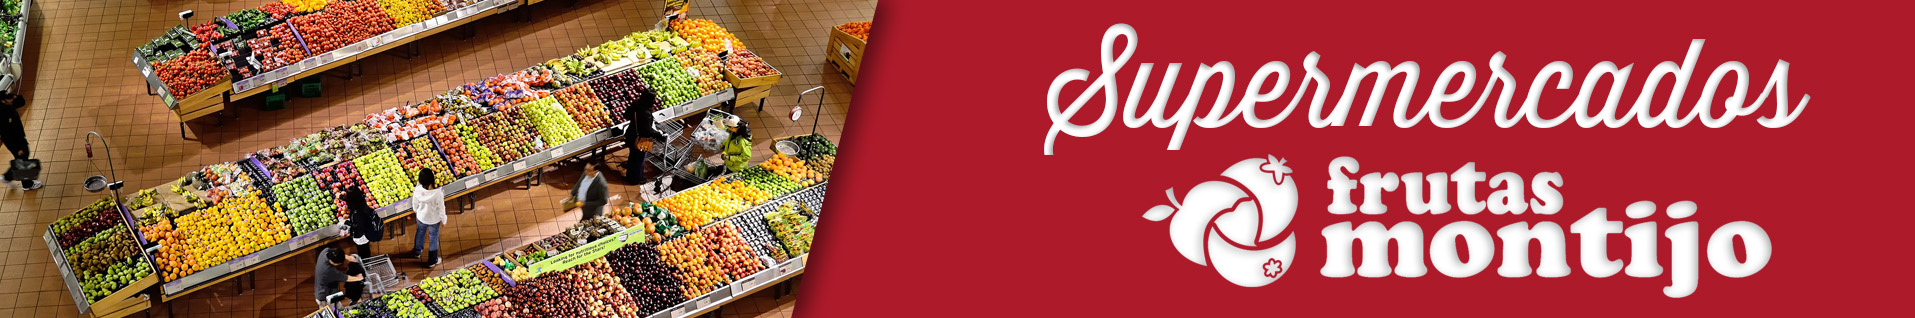 Cabecera Servicios Plataforma Supermercados